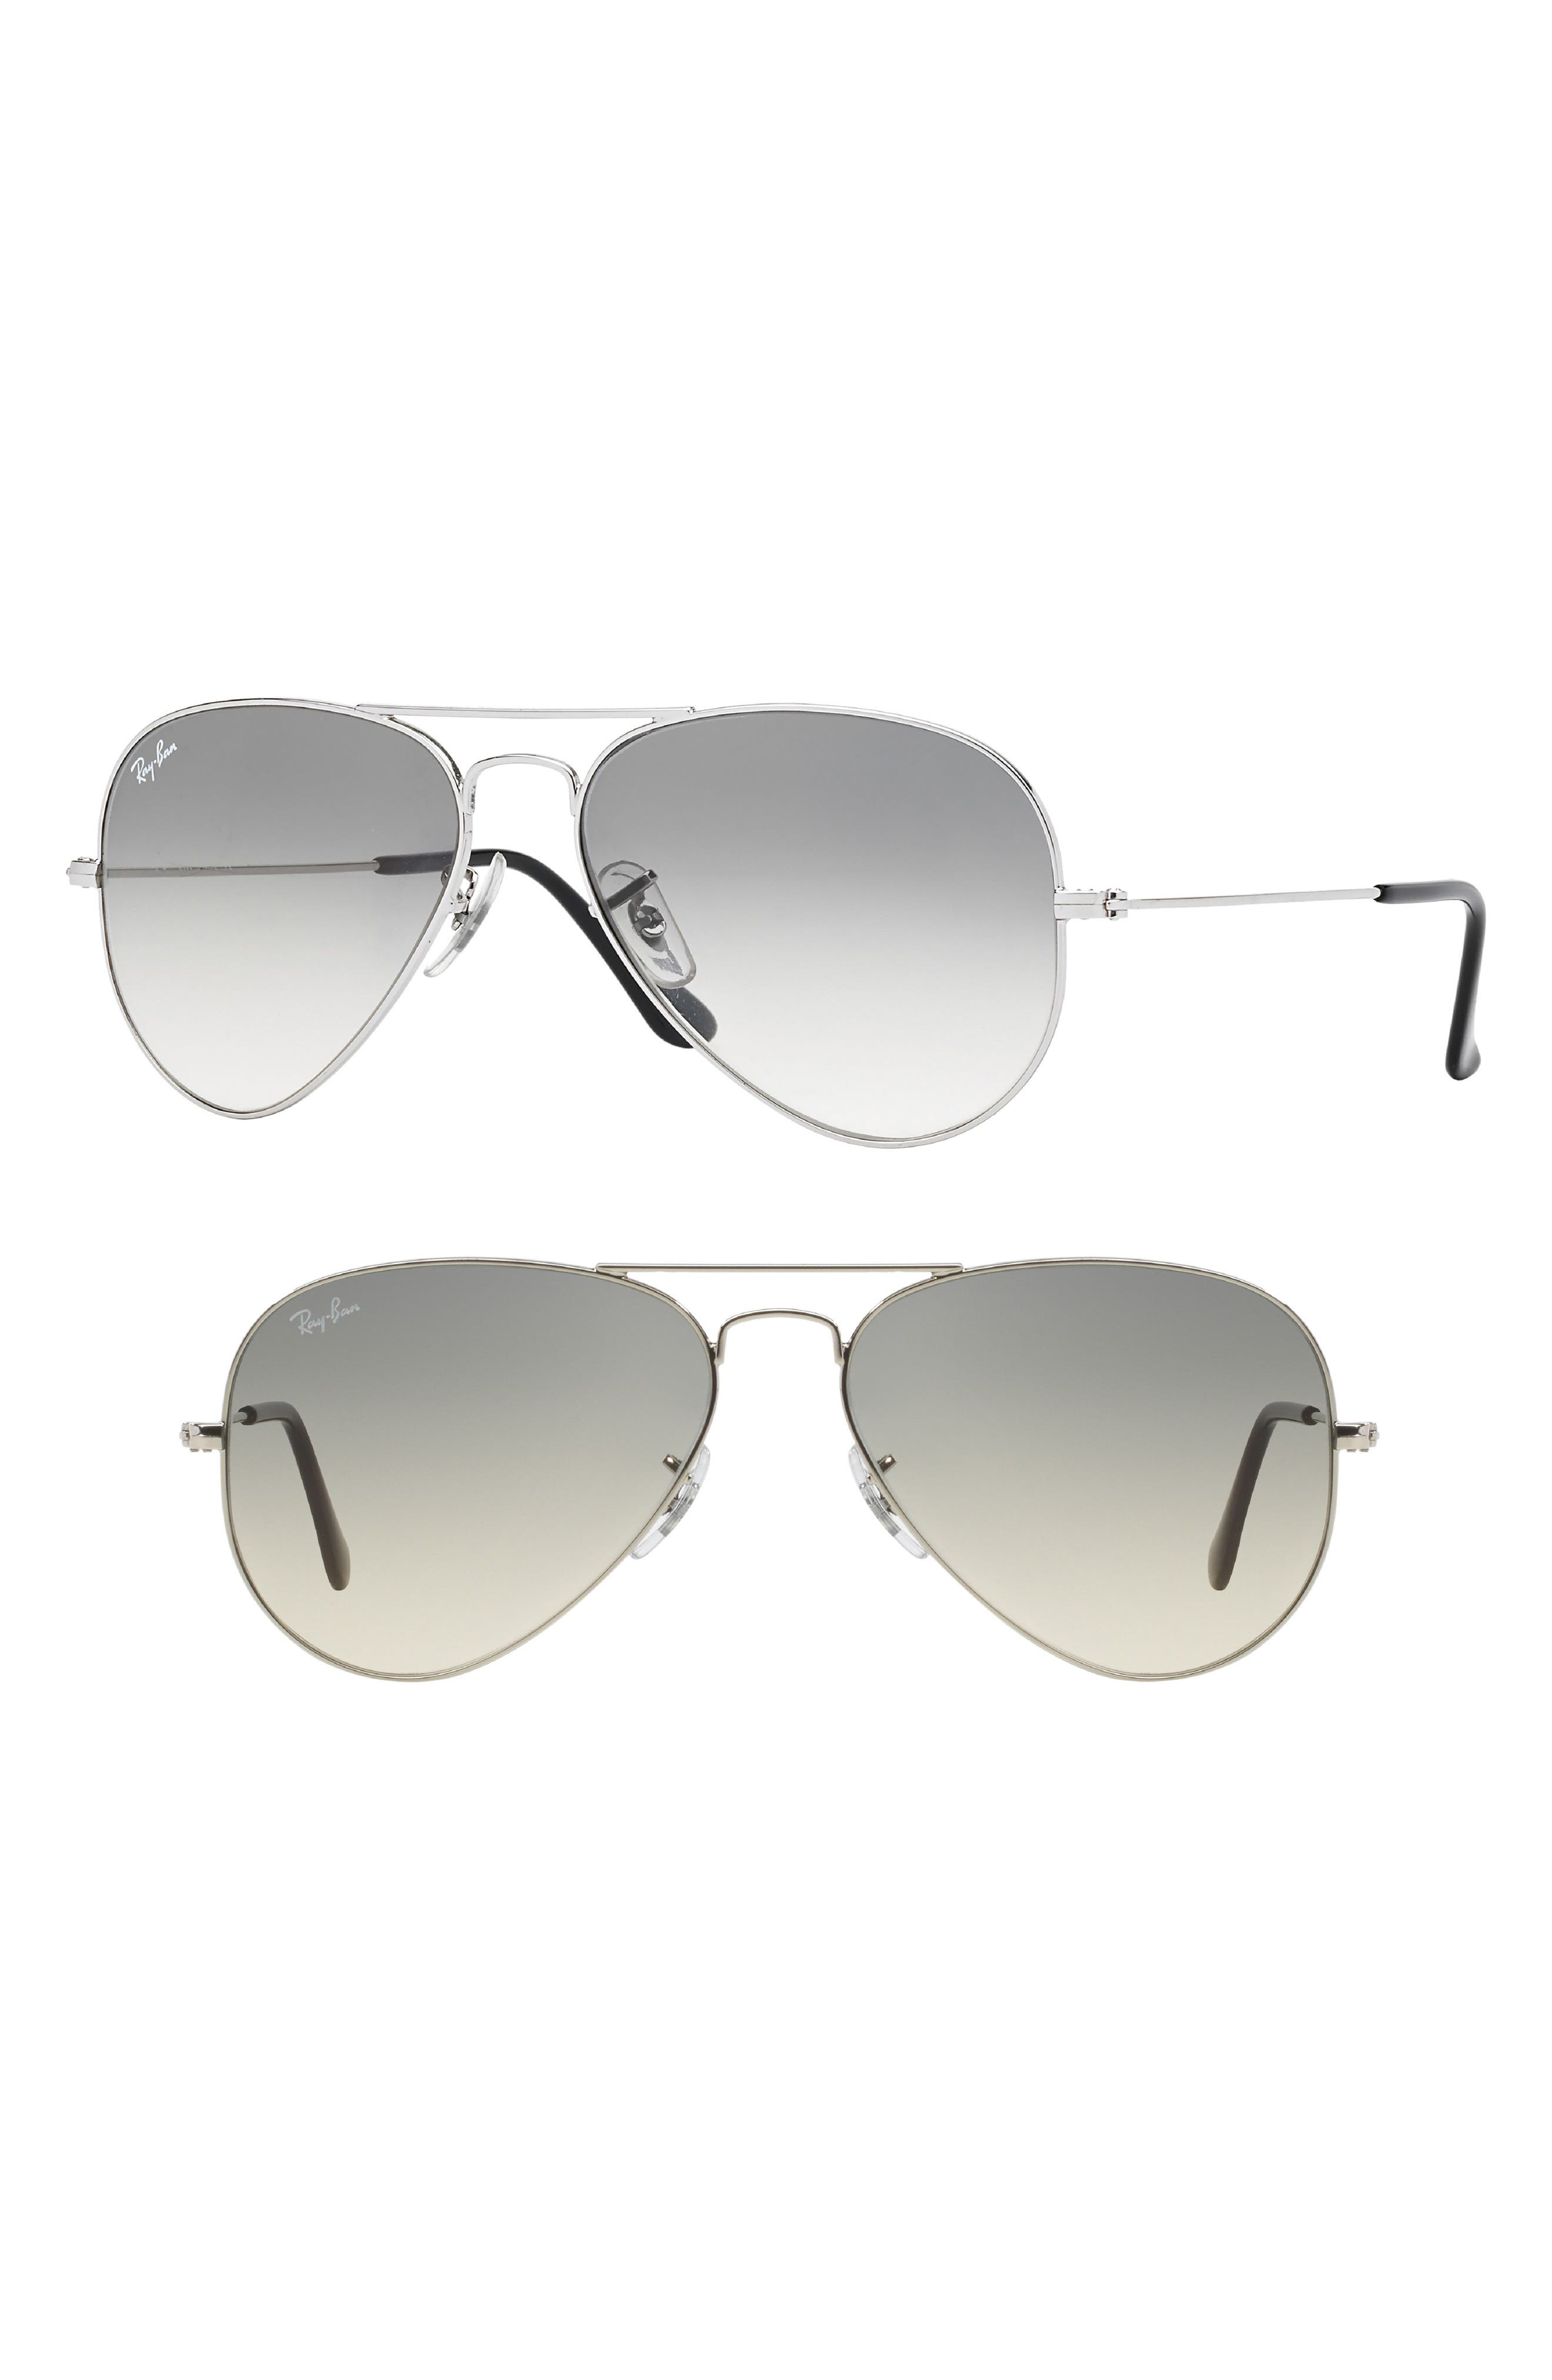 Ray-Ban Standard Original 5m Aviator Sunglasses -